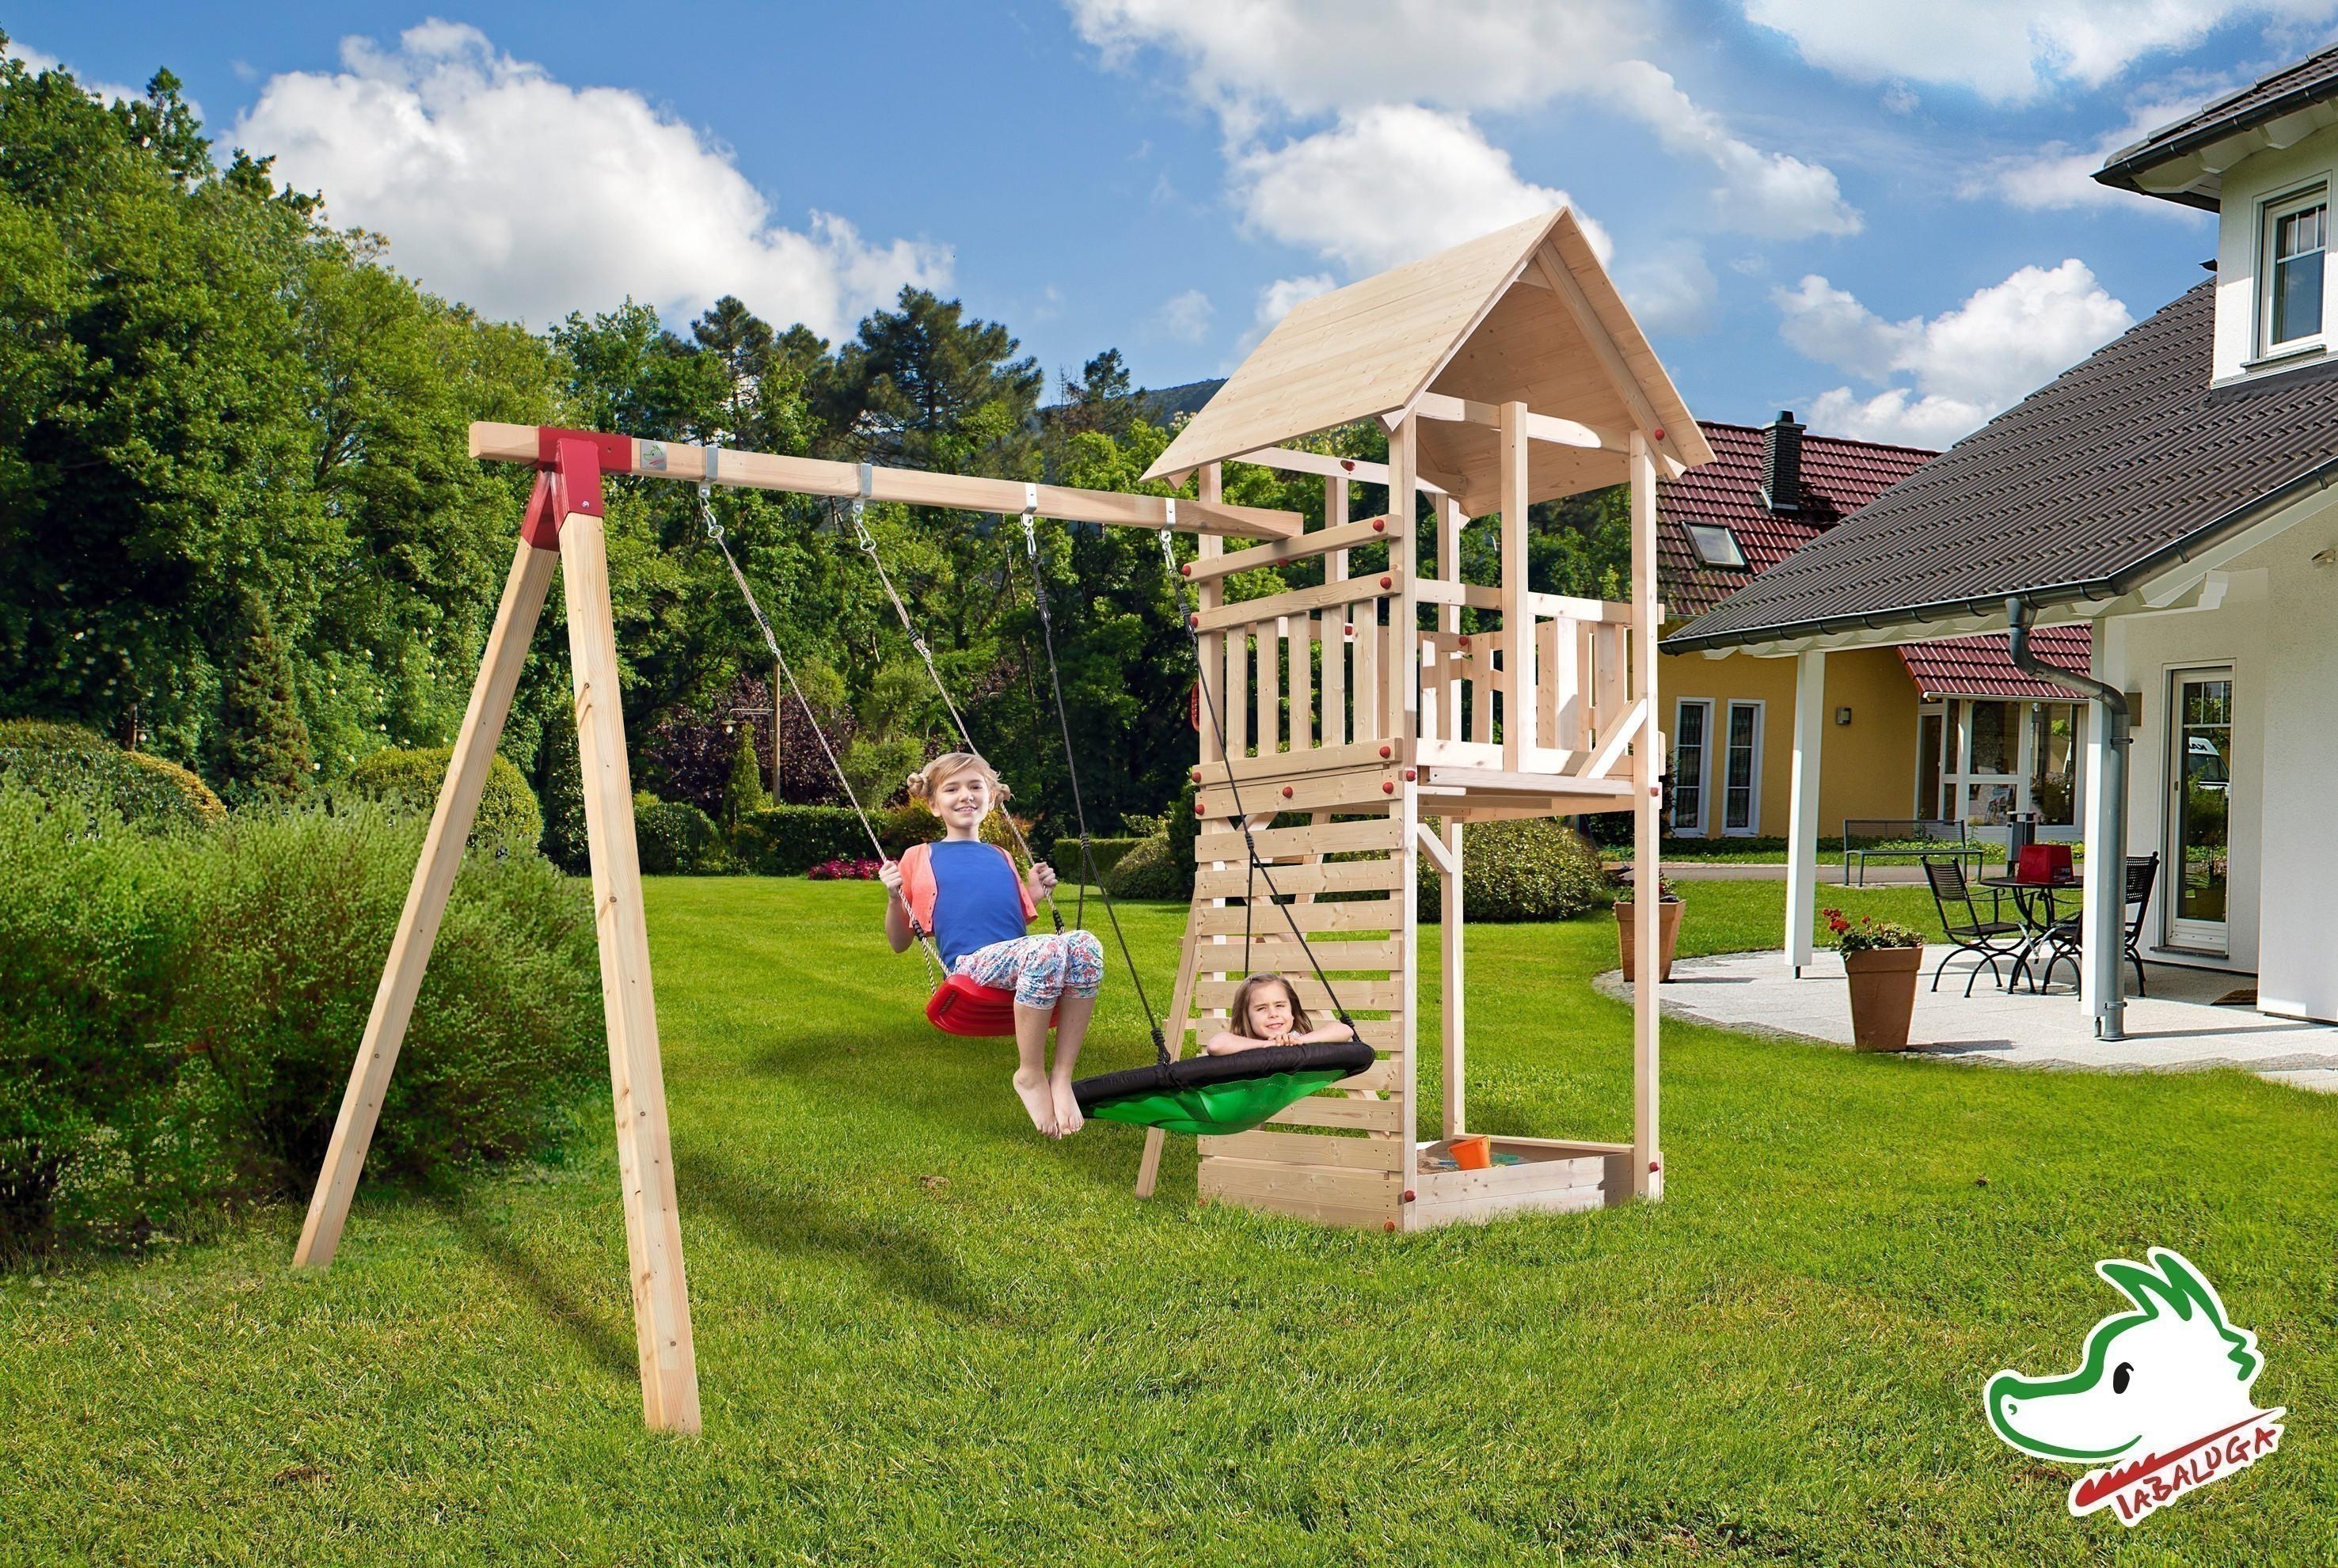 Spielturm Tabaluga Drachenturm Satteldach 100x124cm + Schaukel Bild 1